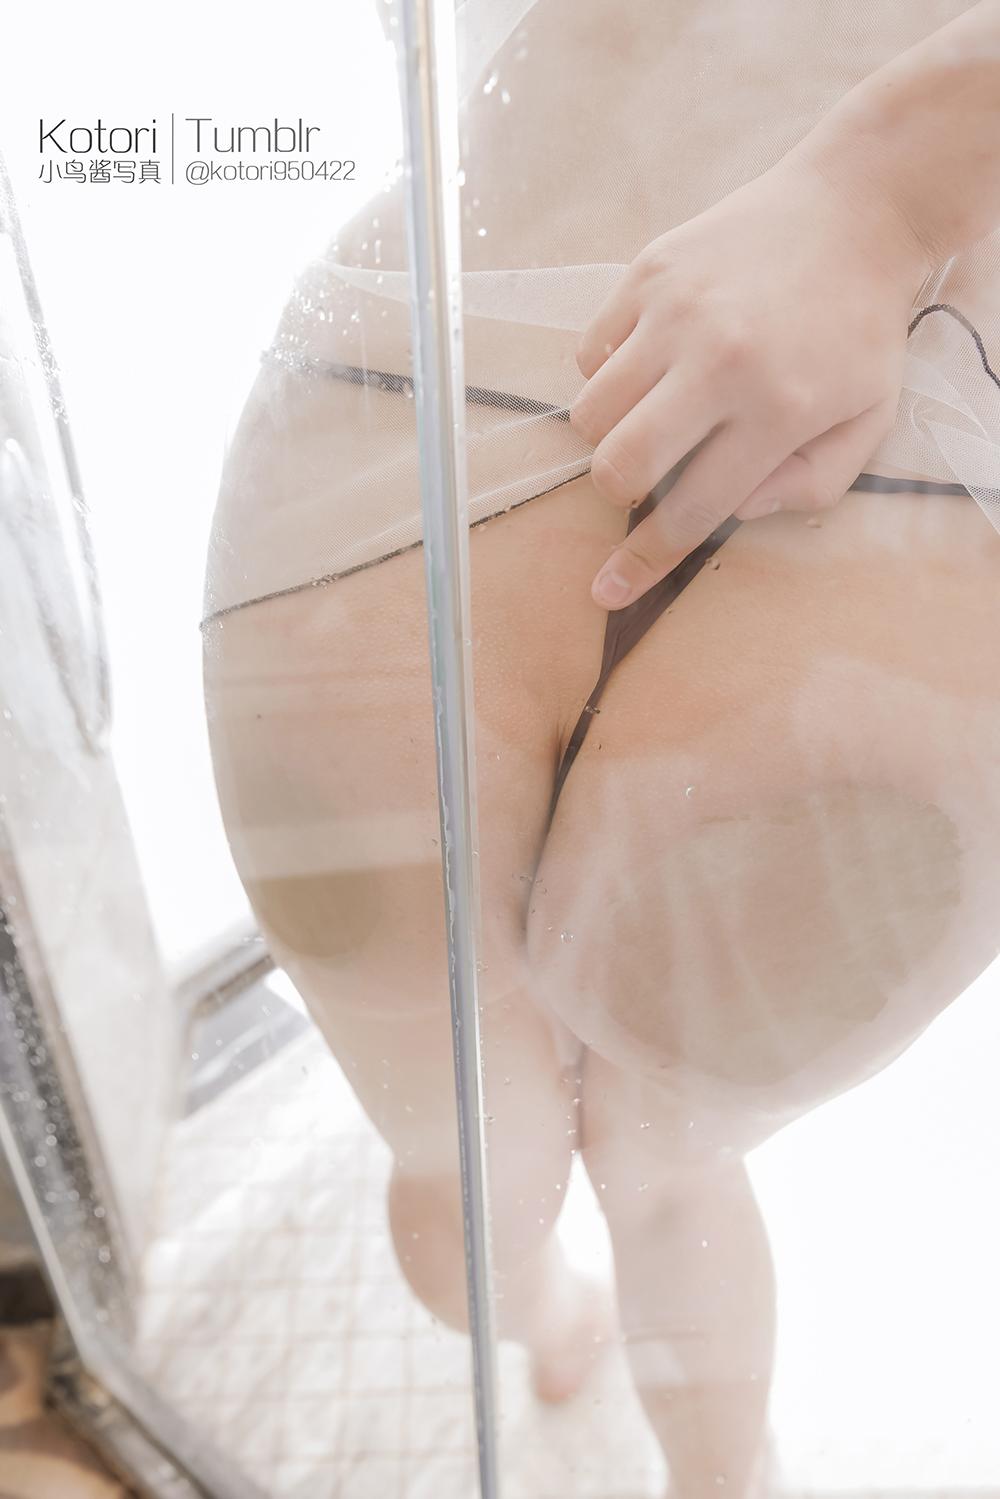 D8Hi3L - Cosplay girl Tumblr PR社 福利姬 小鸟酱 透明薄纱装